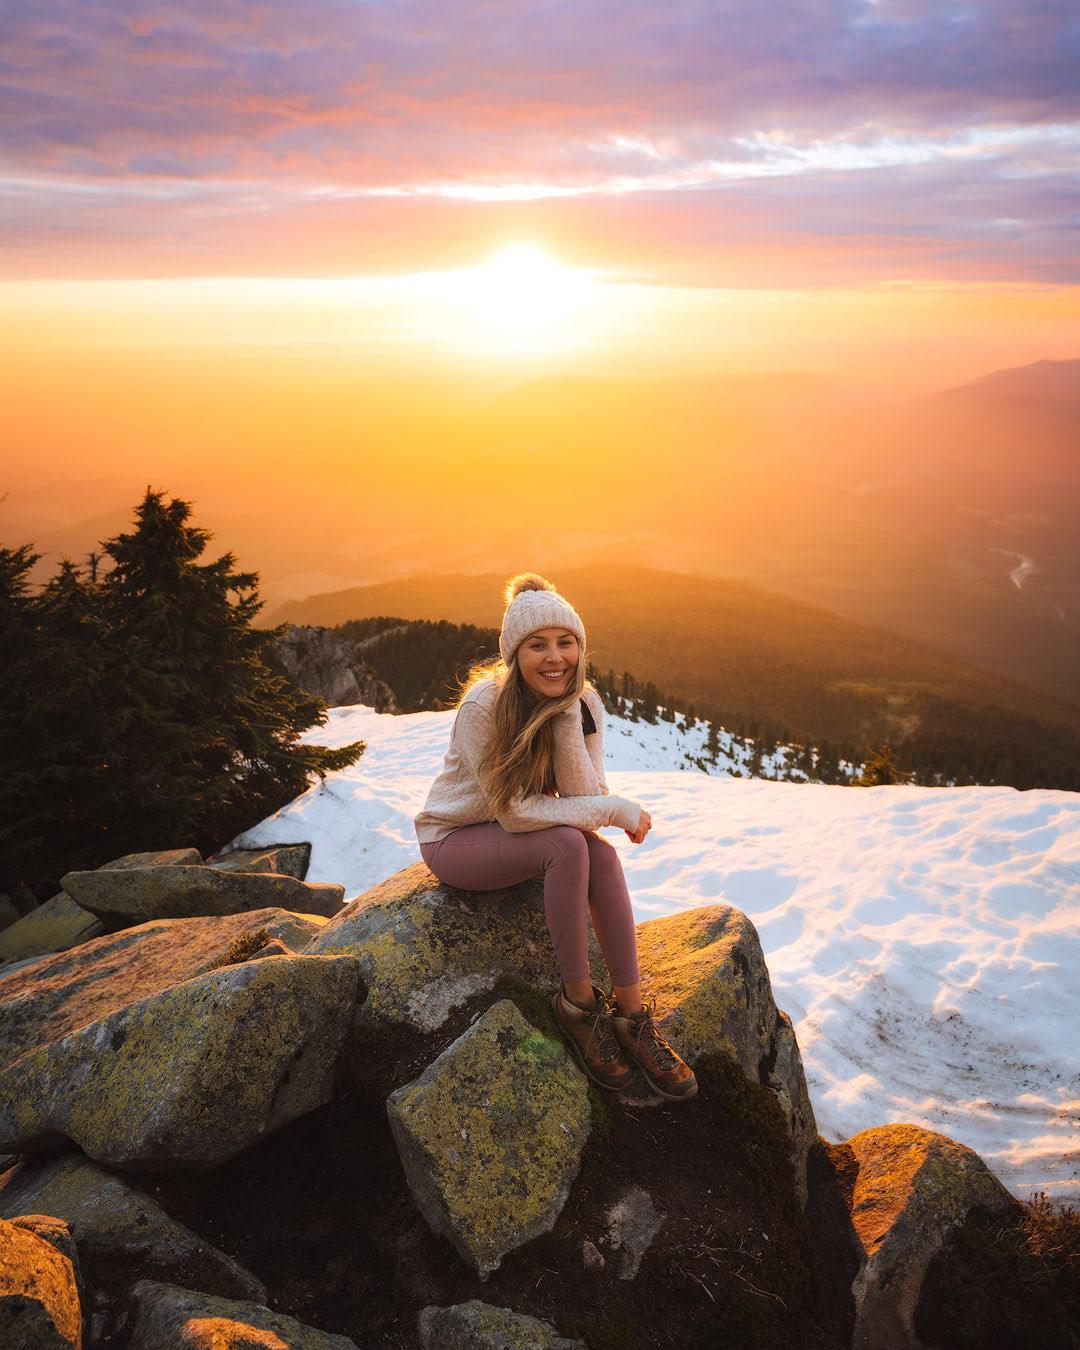 Beginner Friendly Hikes in Washington State - Mount Pilchuck